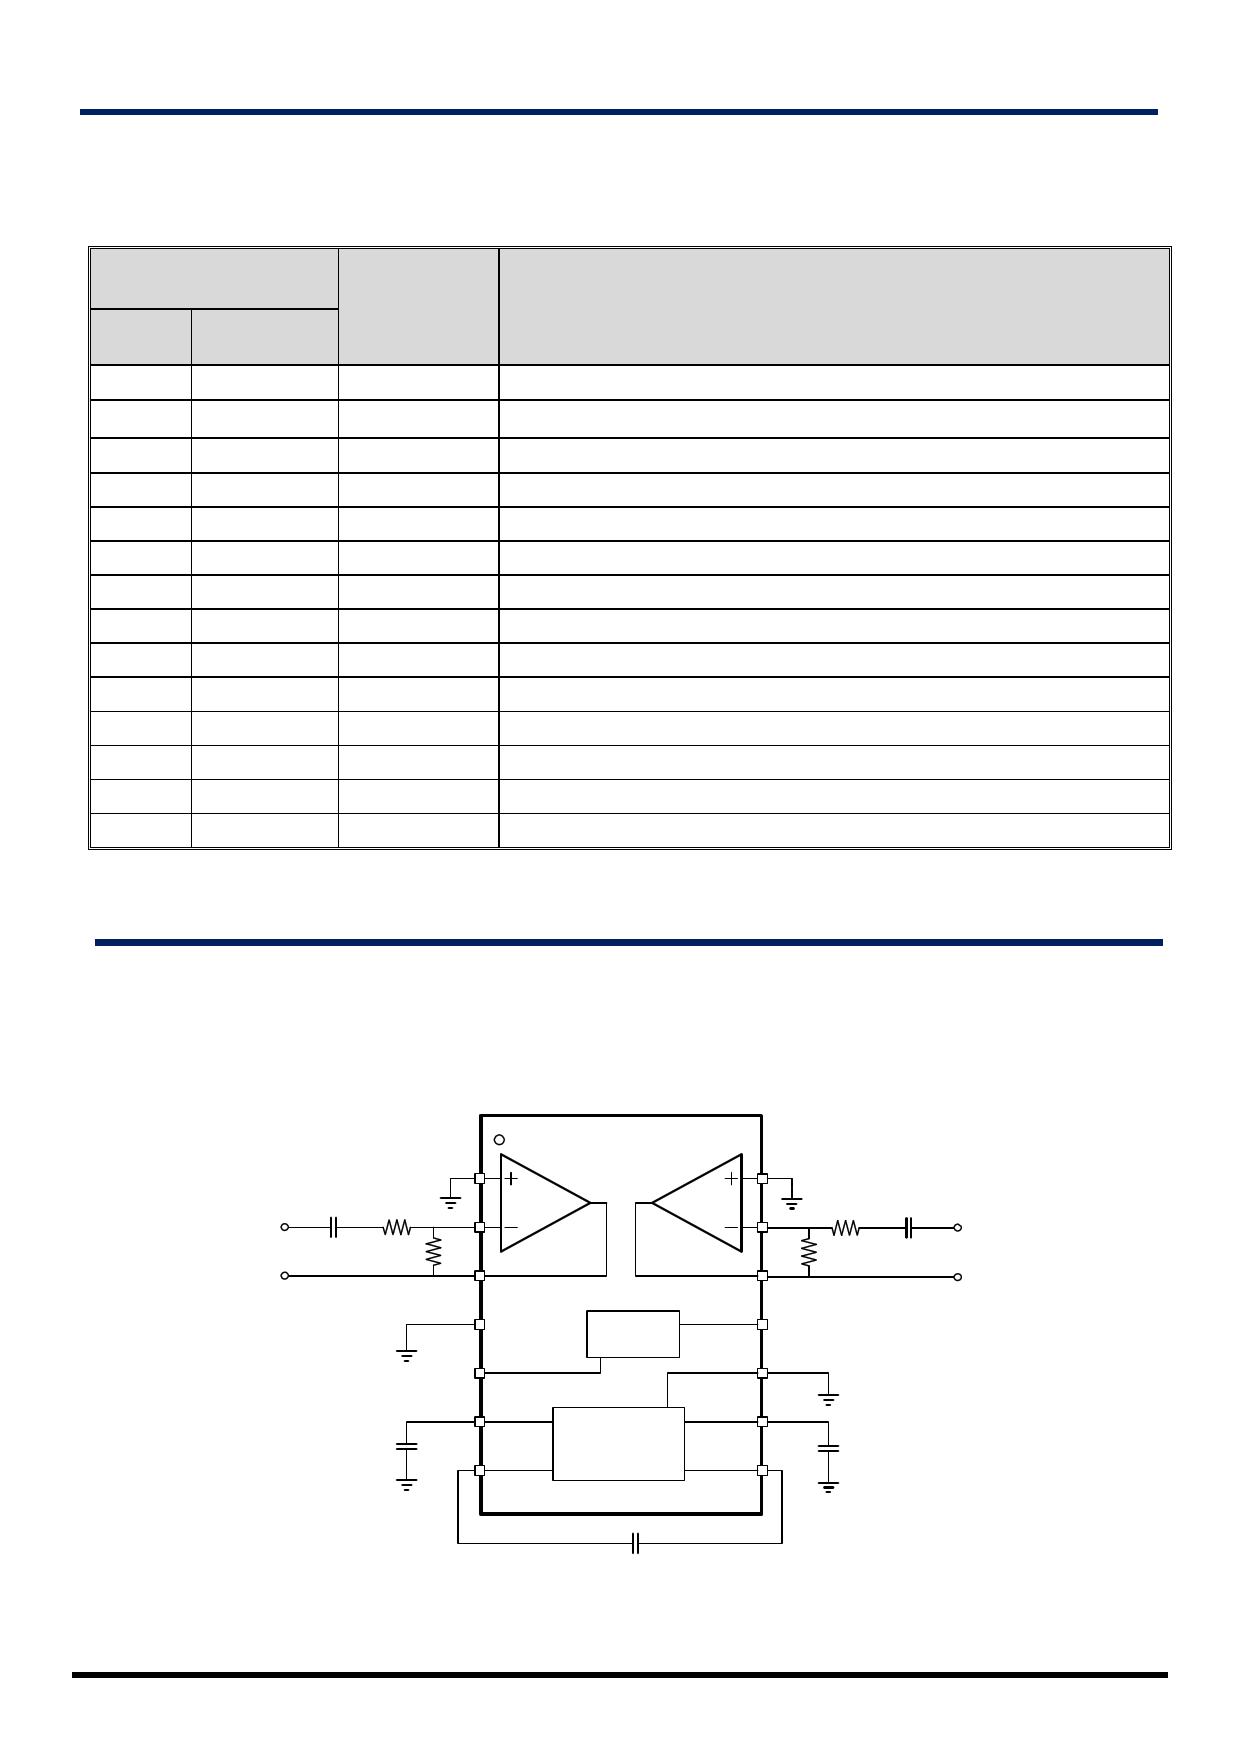 TPF607 pdf, arduino